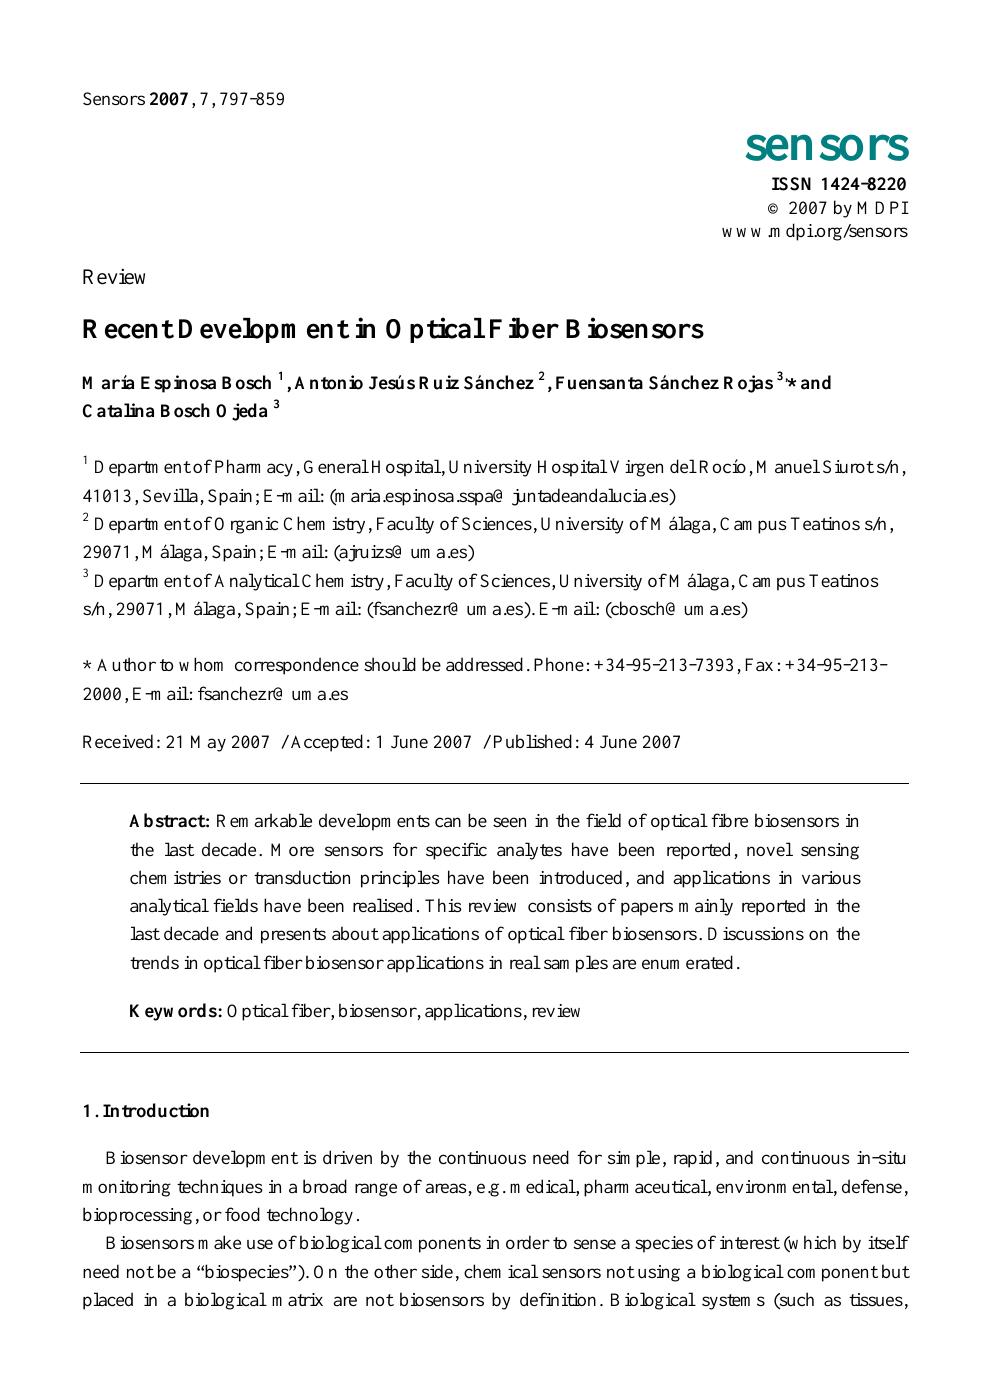 Recent Development in Optical Fiber Biosensors – topic of